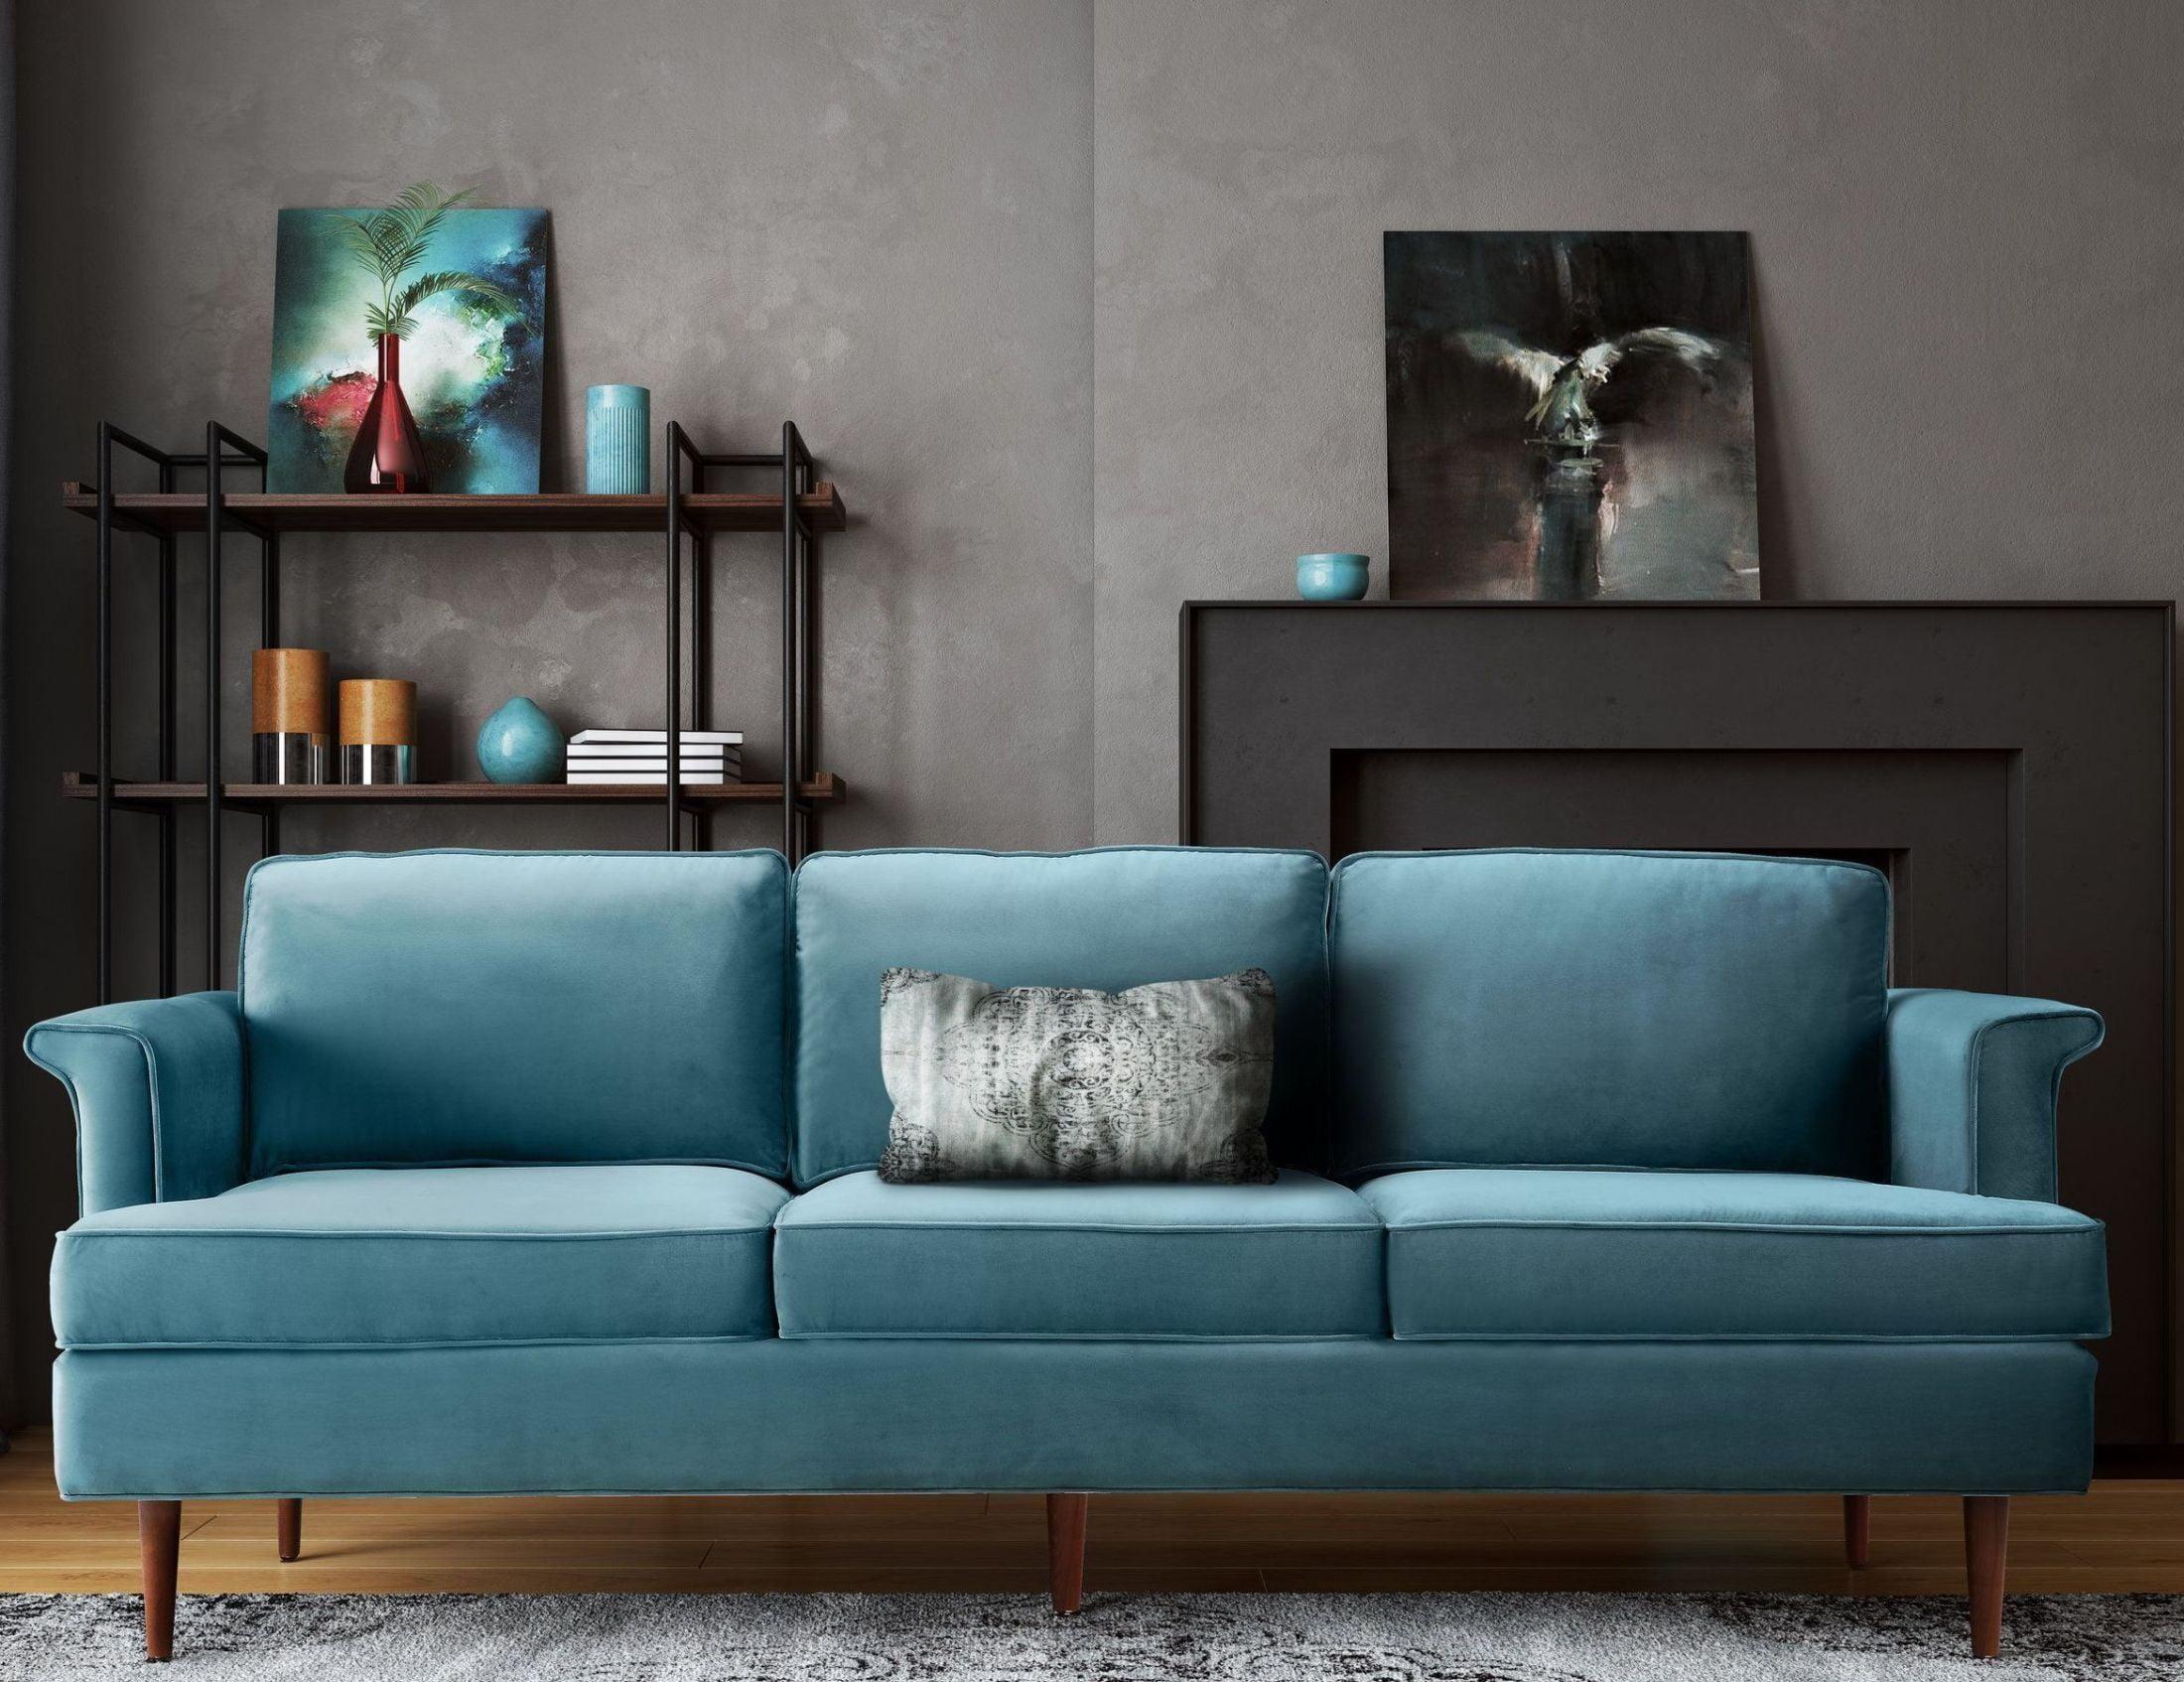 Porter Sea Blue Sofa from TOV